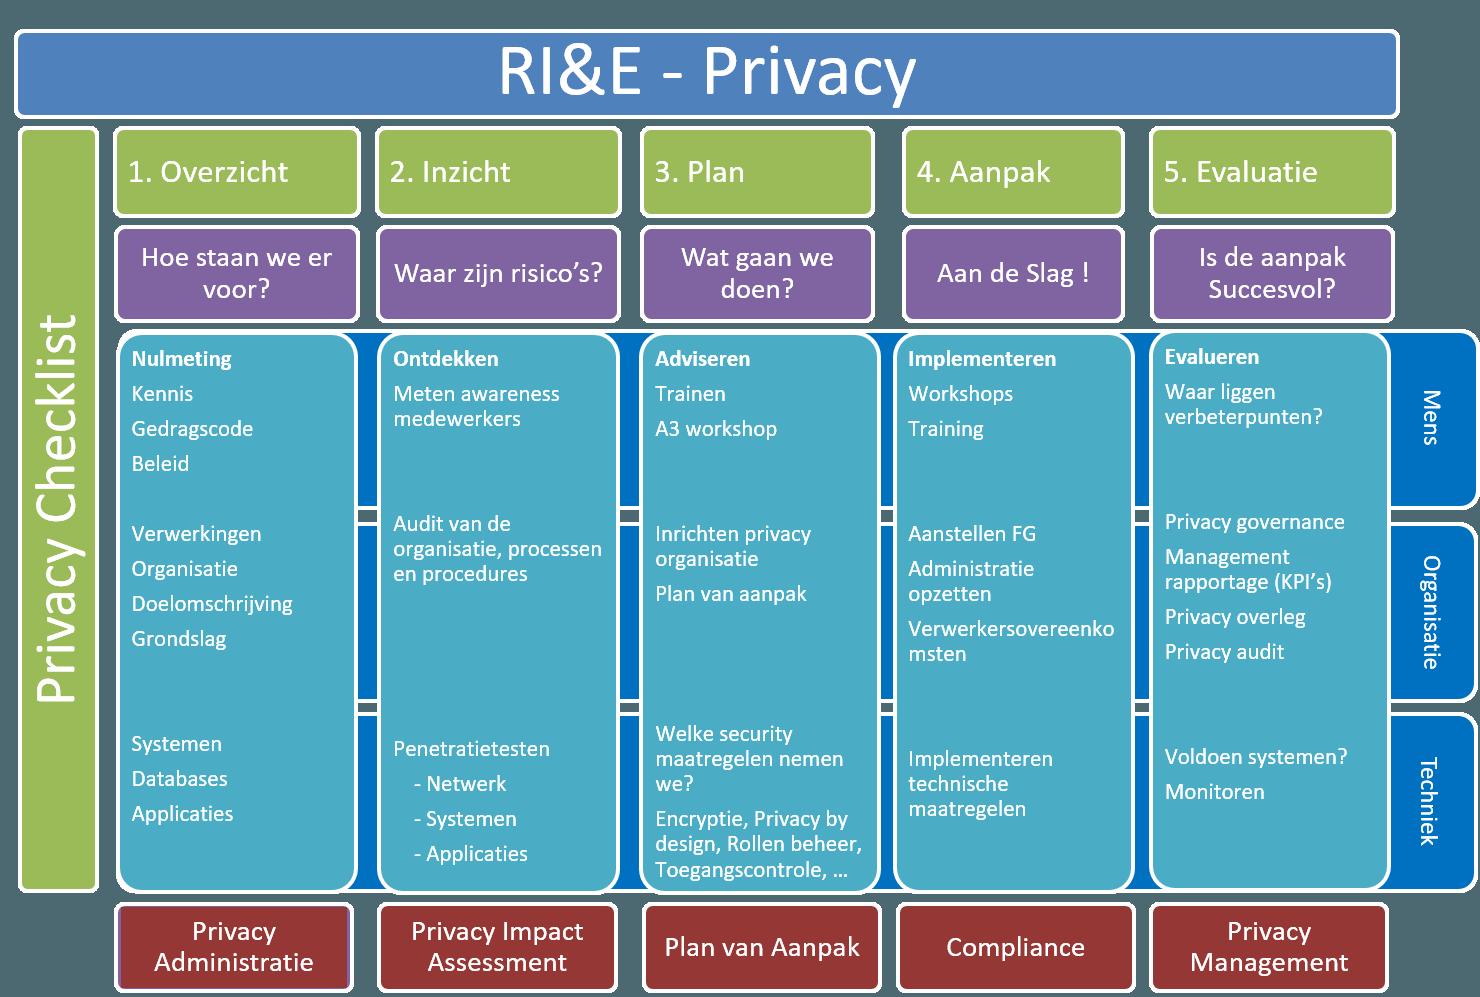 Opzetten privacy administratie. privacy impact assessment, plan van aanpak, compliance, privacy management